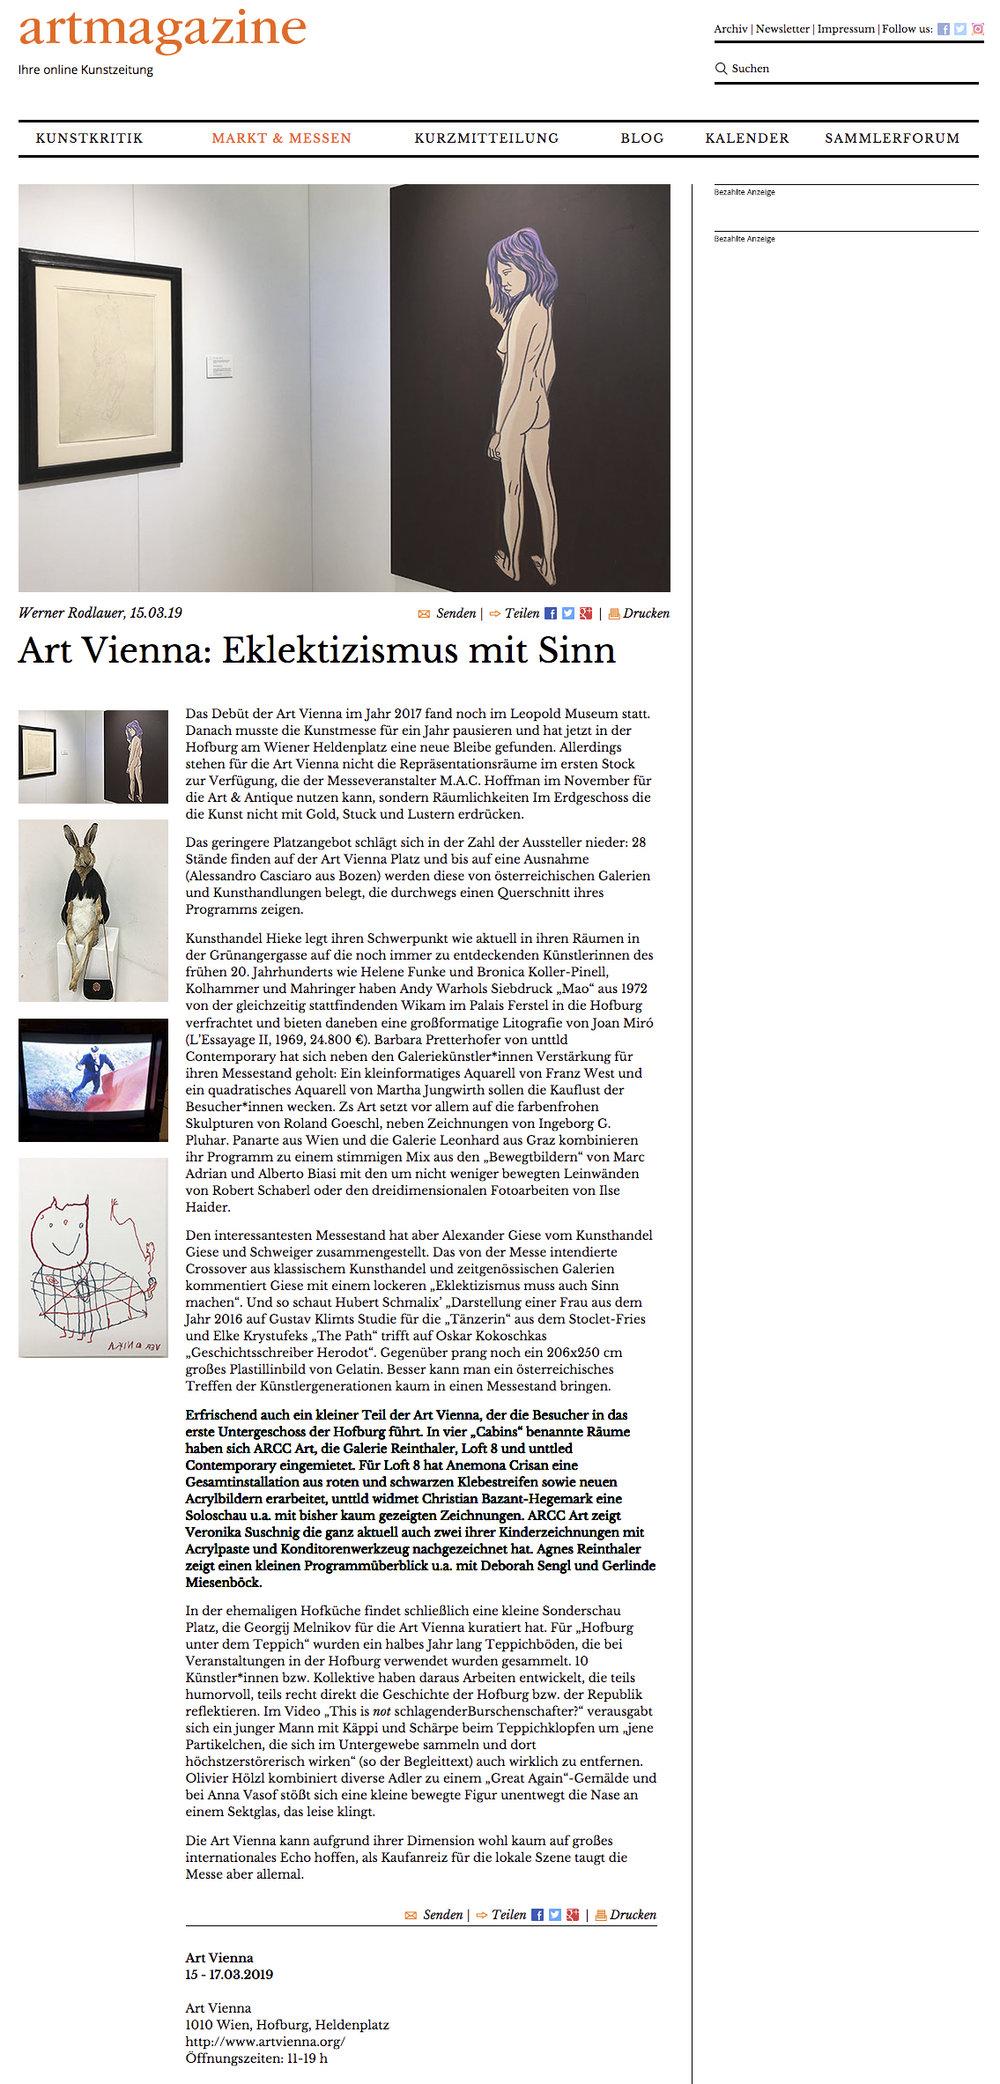 Pressestimme_190315_artmagazine.jpg